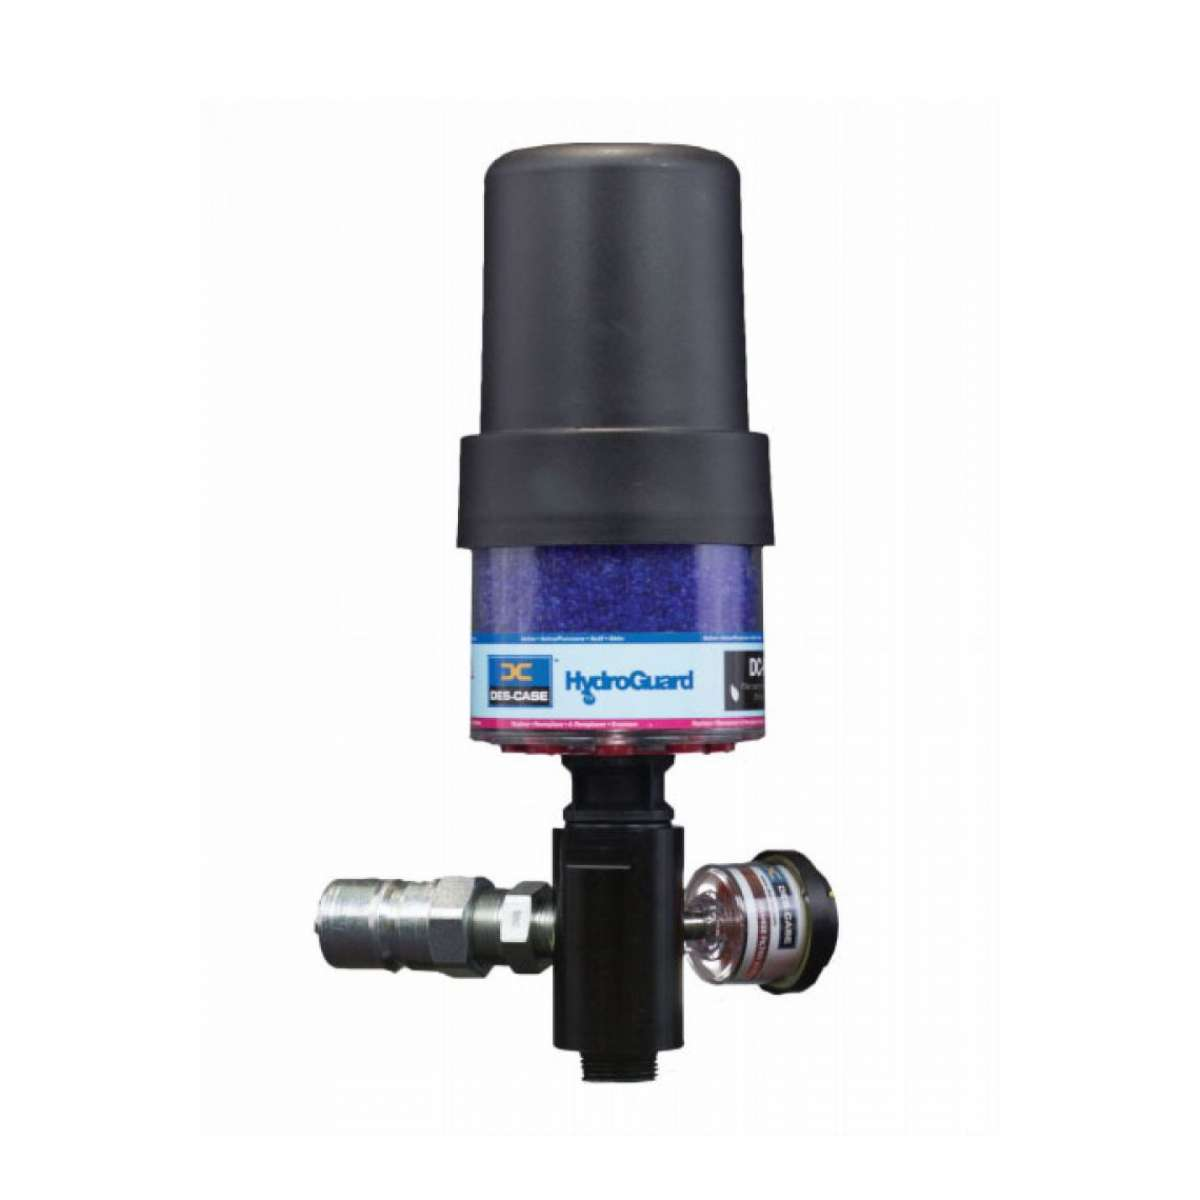 Custom Gearbox Adapter - Black